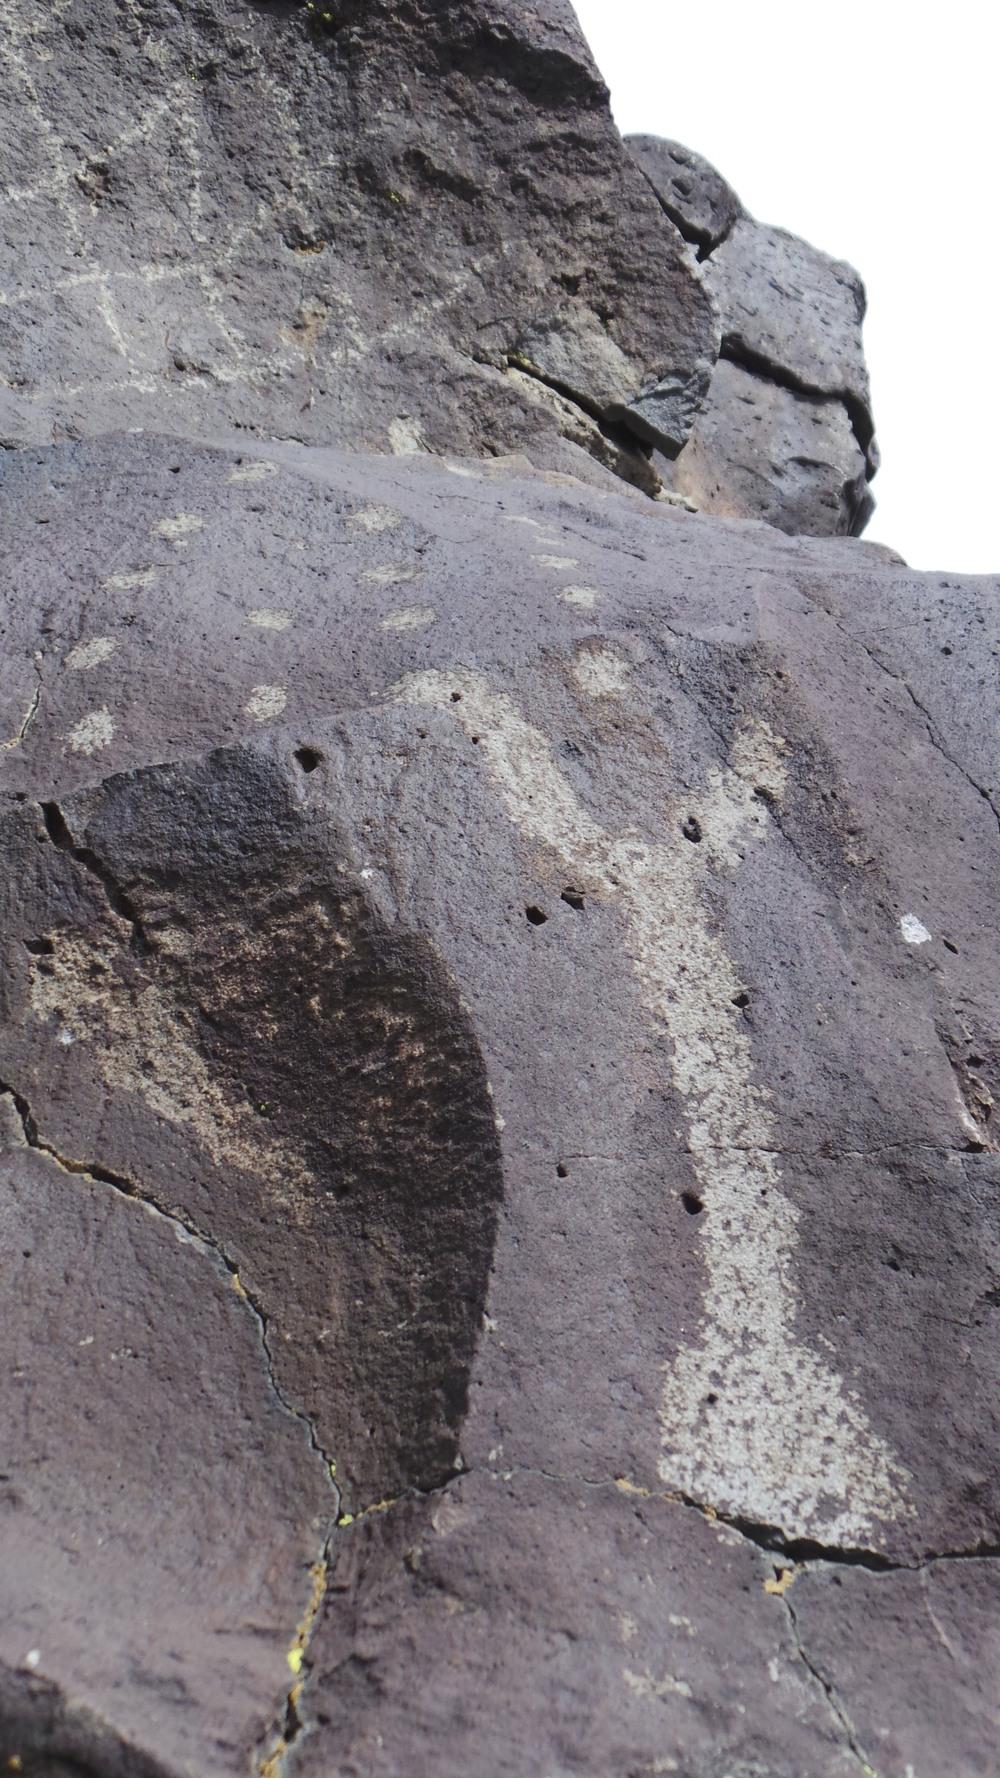 Lagomarsino Petroglyph Site 250.jpg